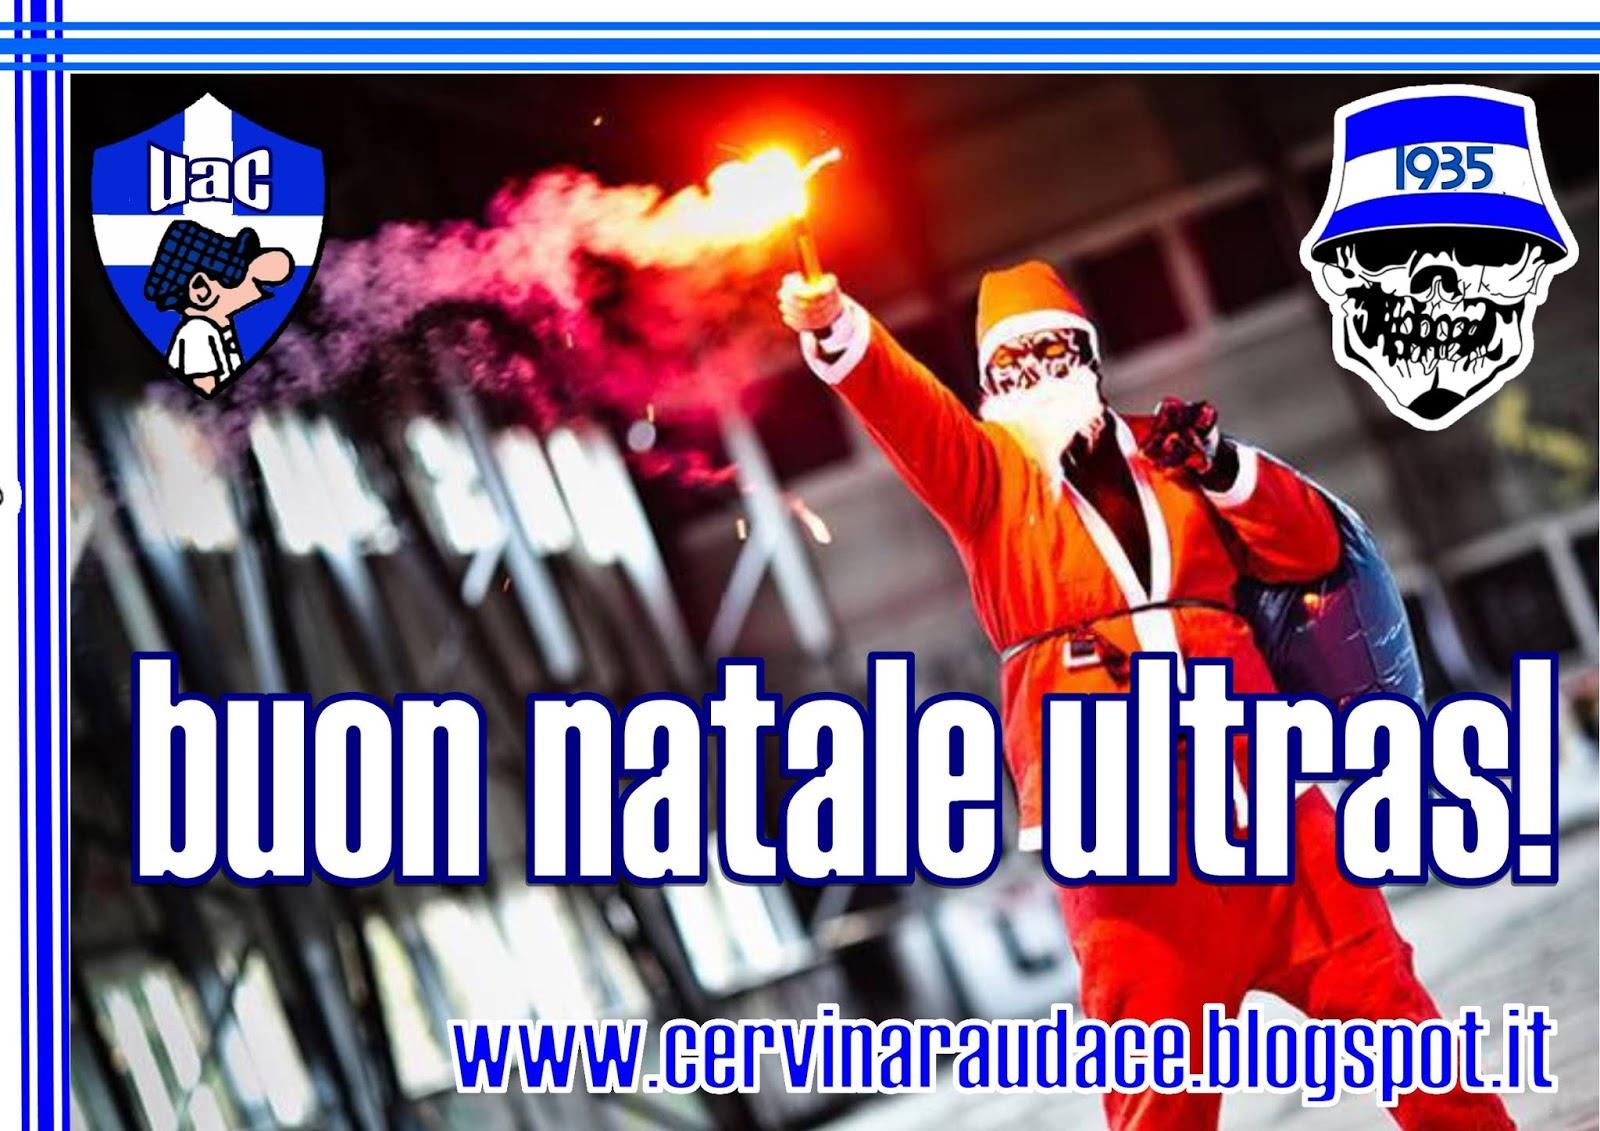 Buon Natale Ultras.Ultras Audax Cervinara Buon Natale Ultras